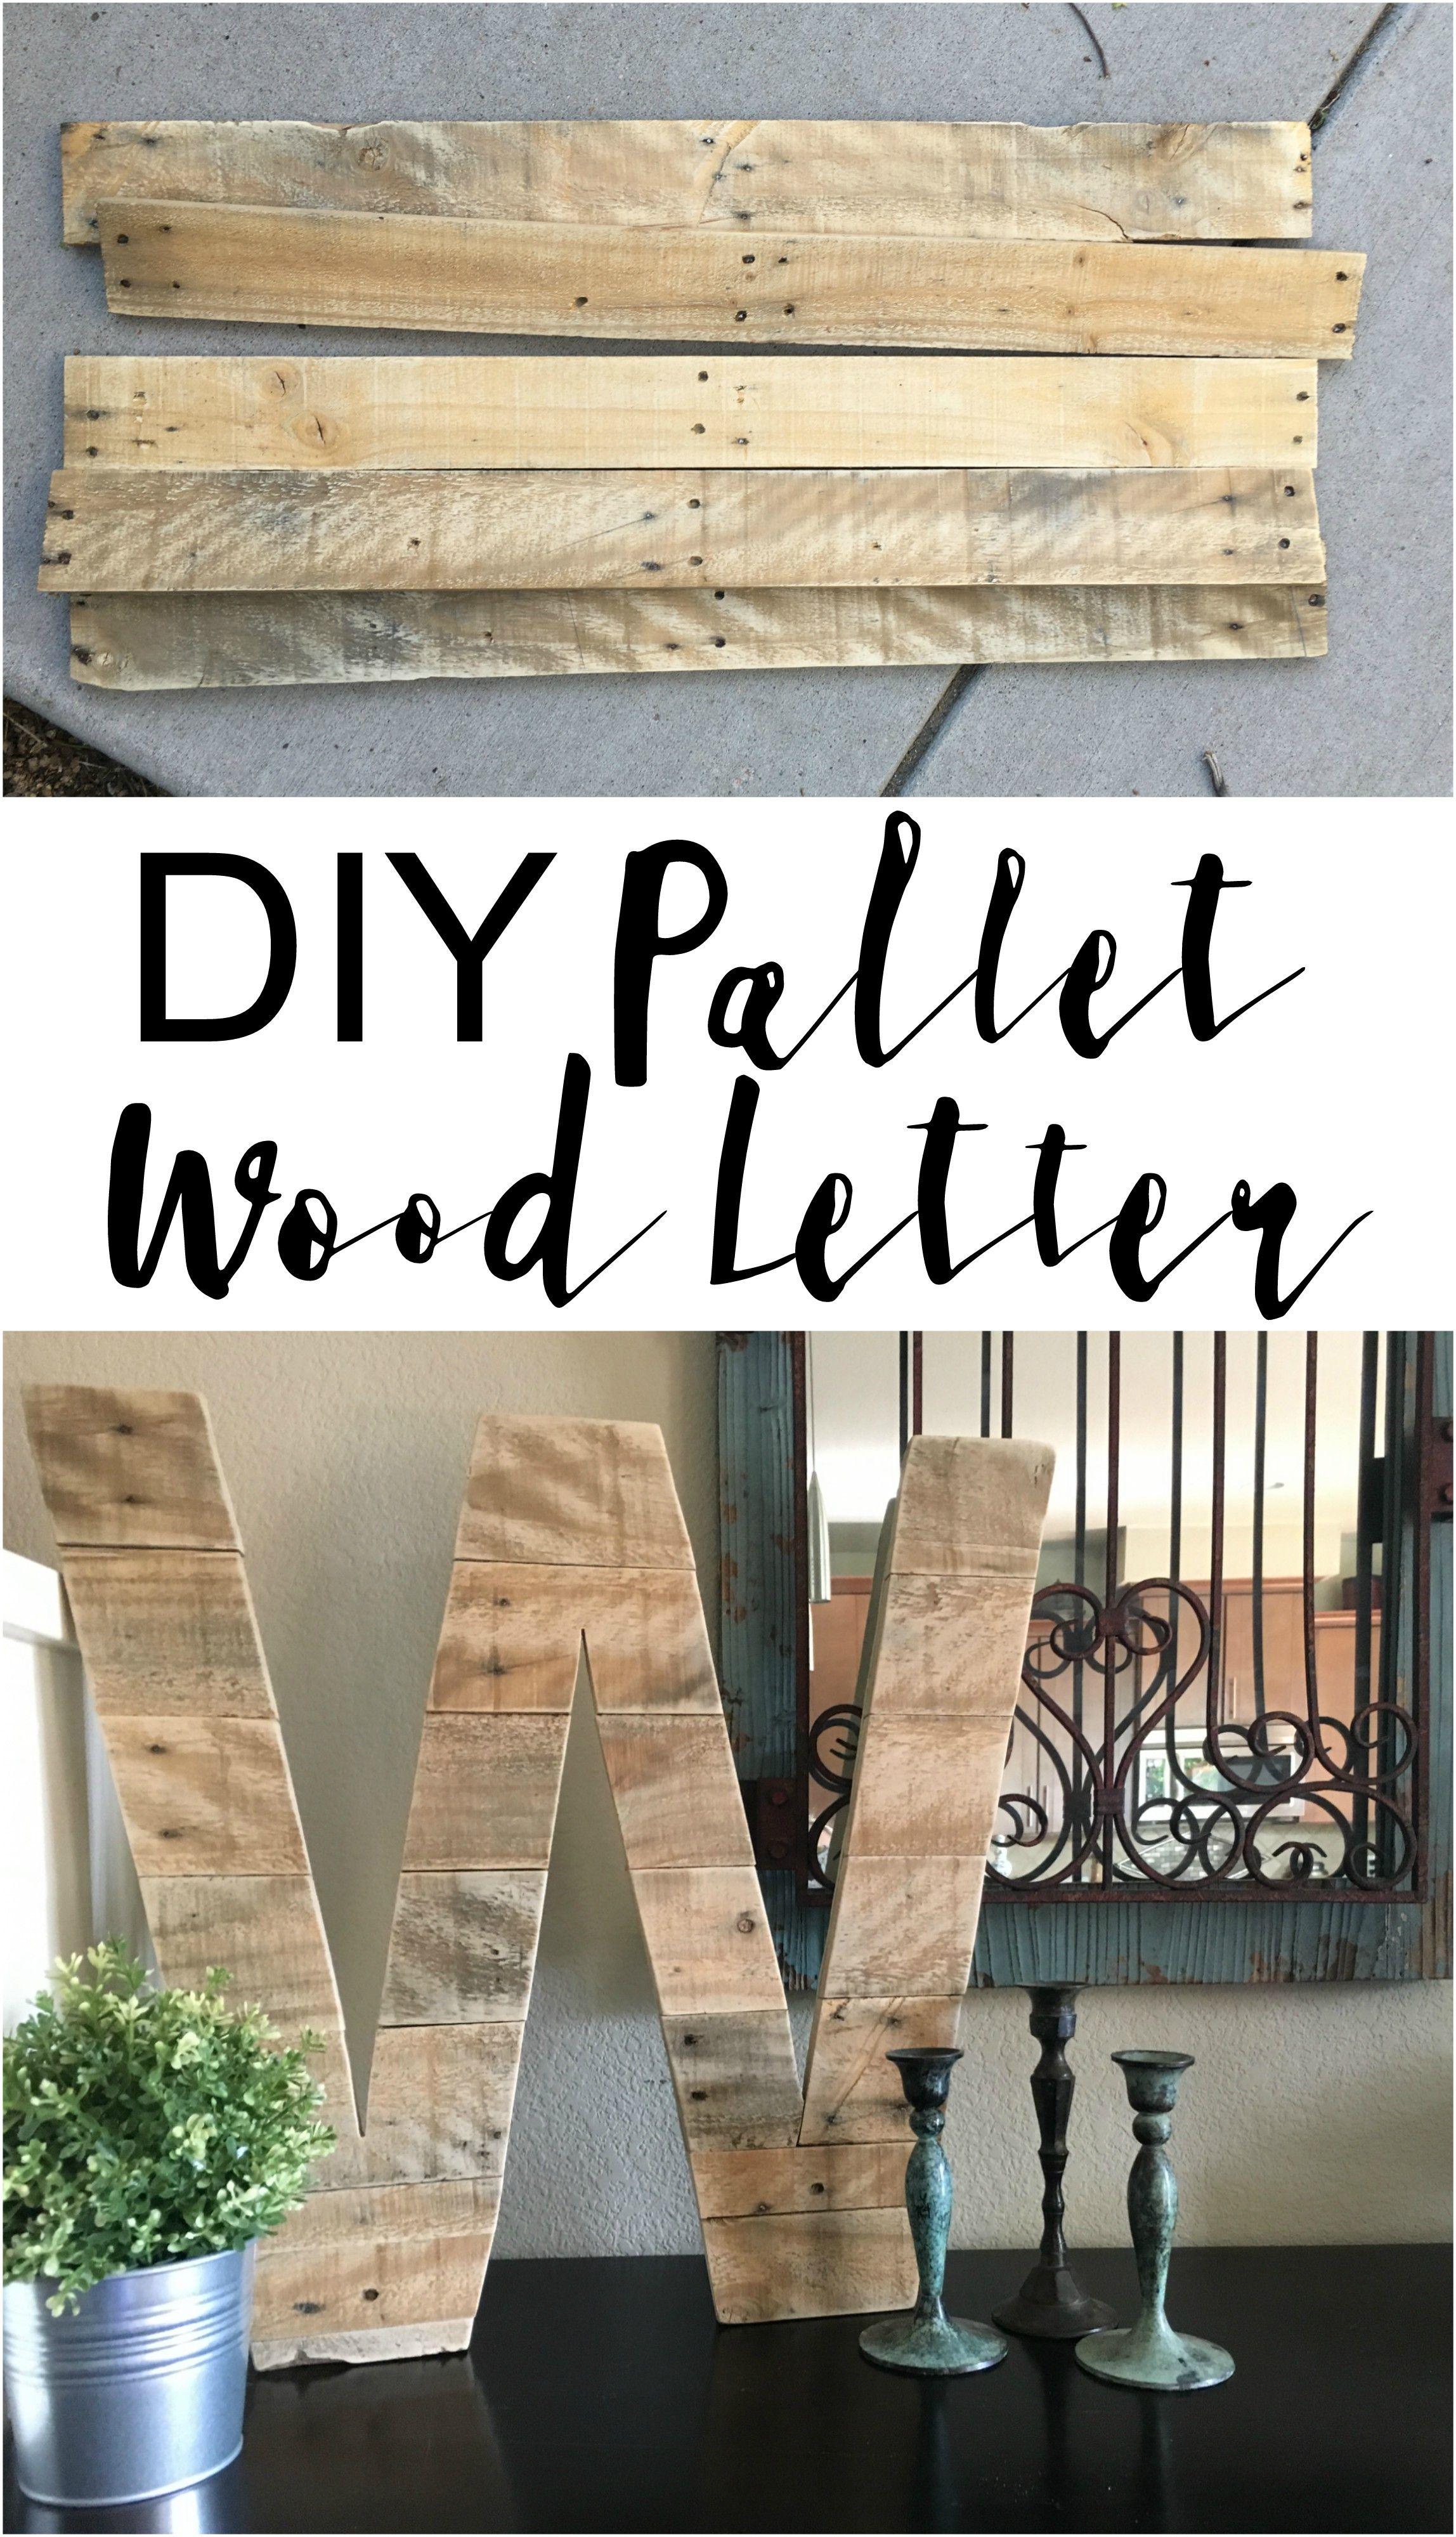 Diy Pallet Wood Letter Pallet Diy Diy Pallet Projects Wood Pallets